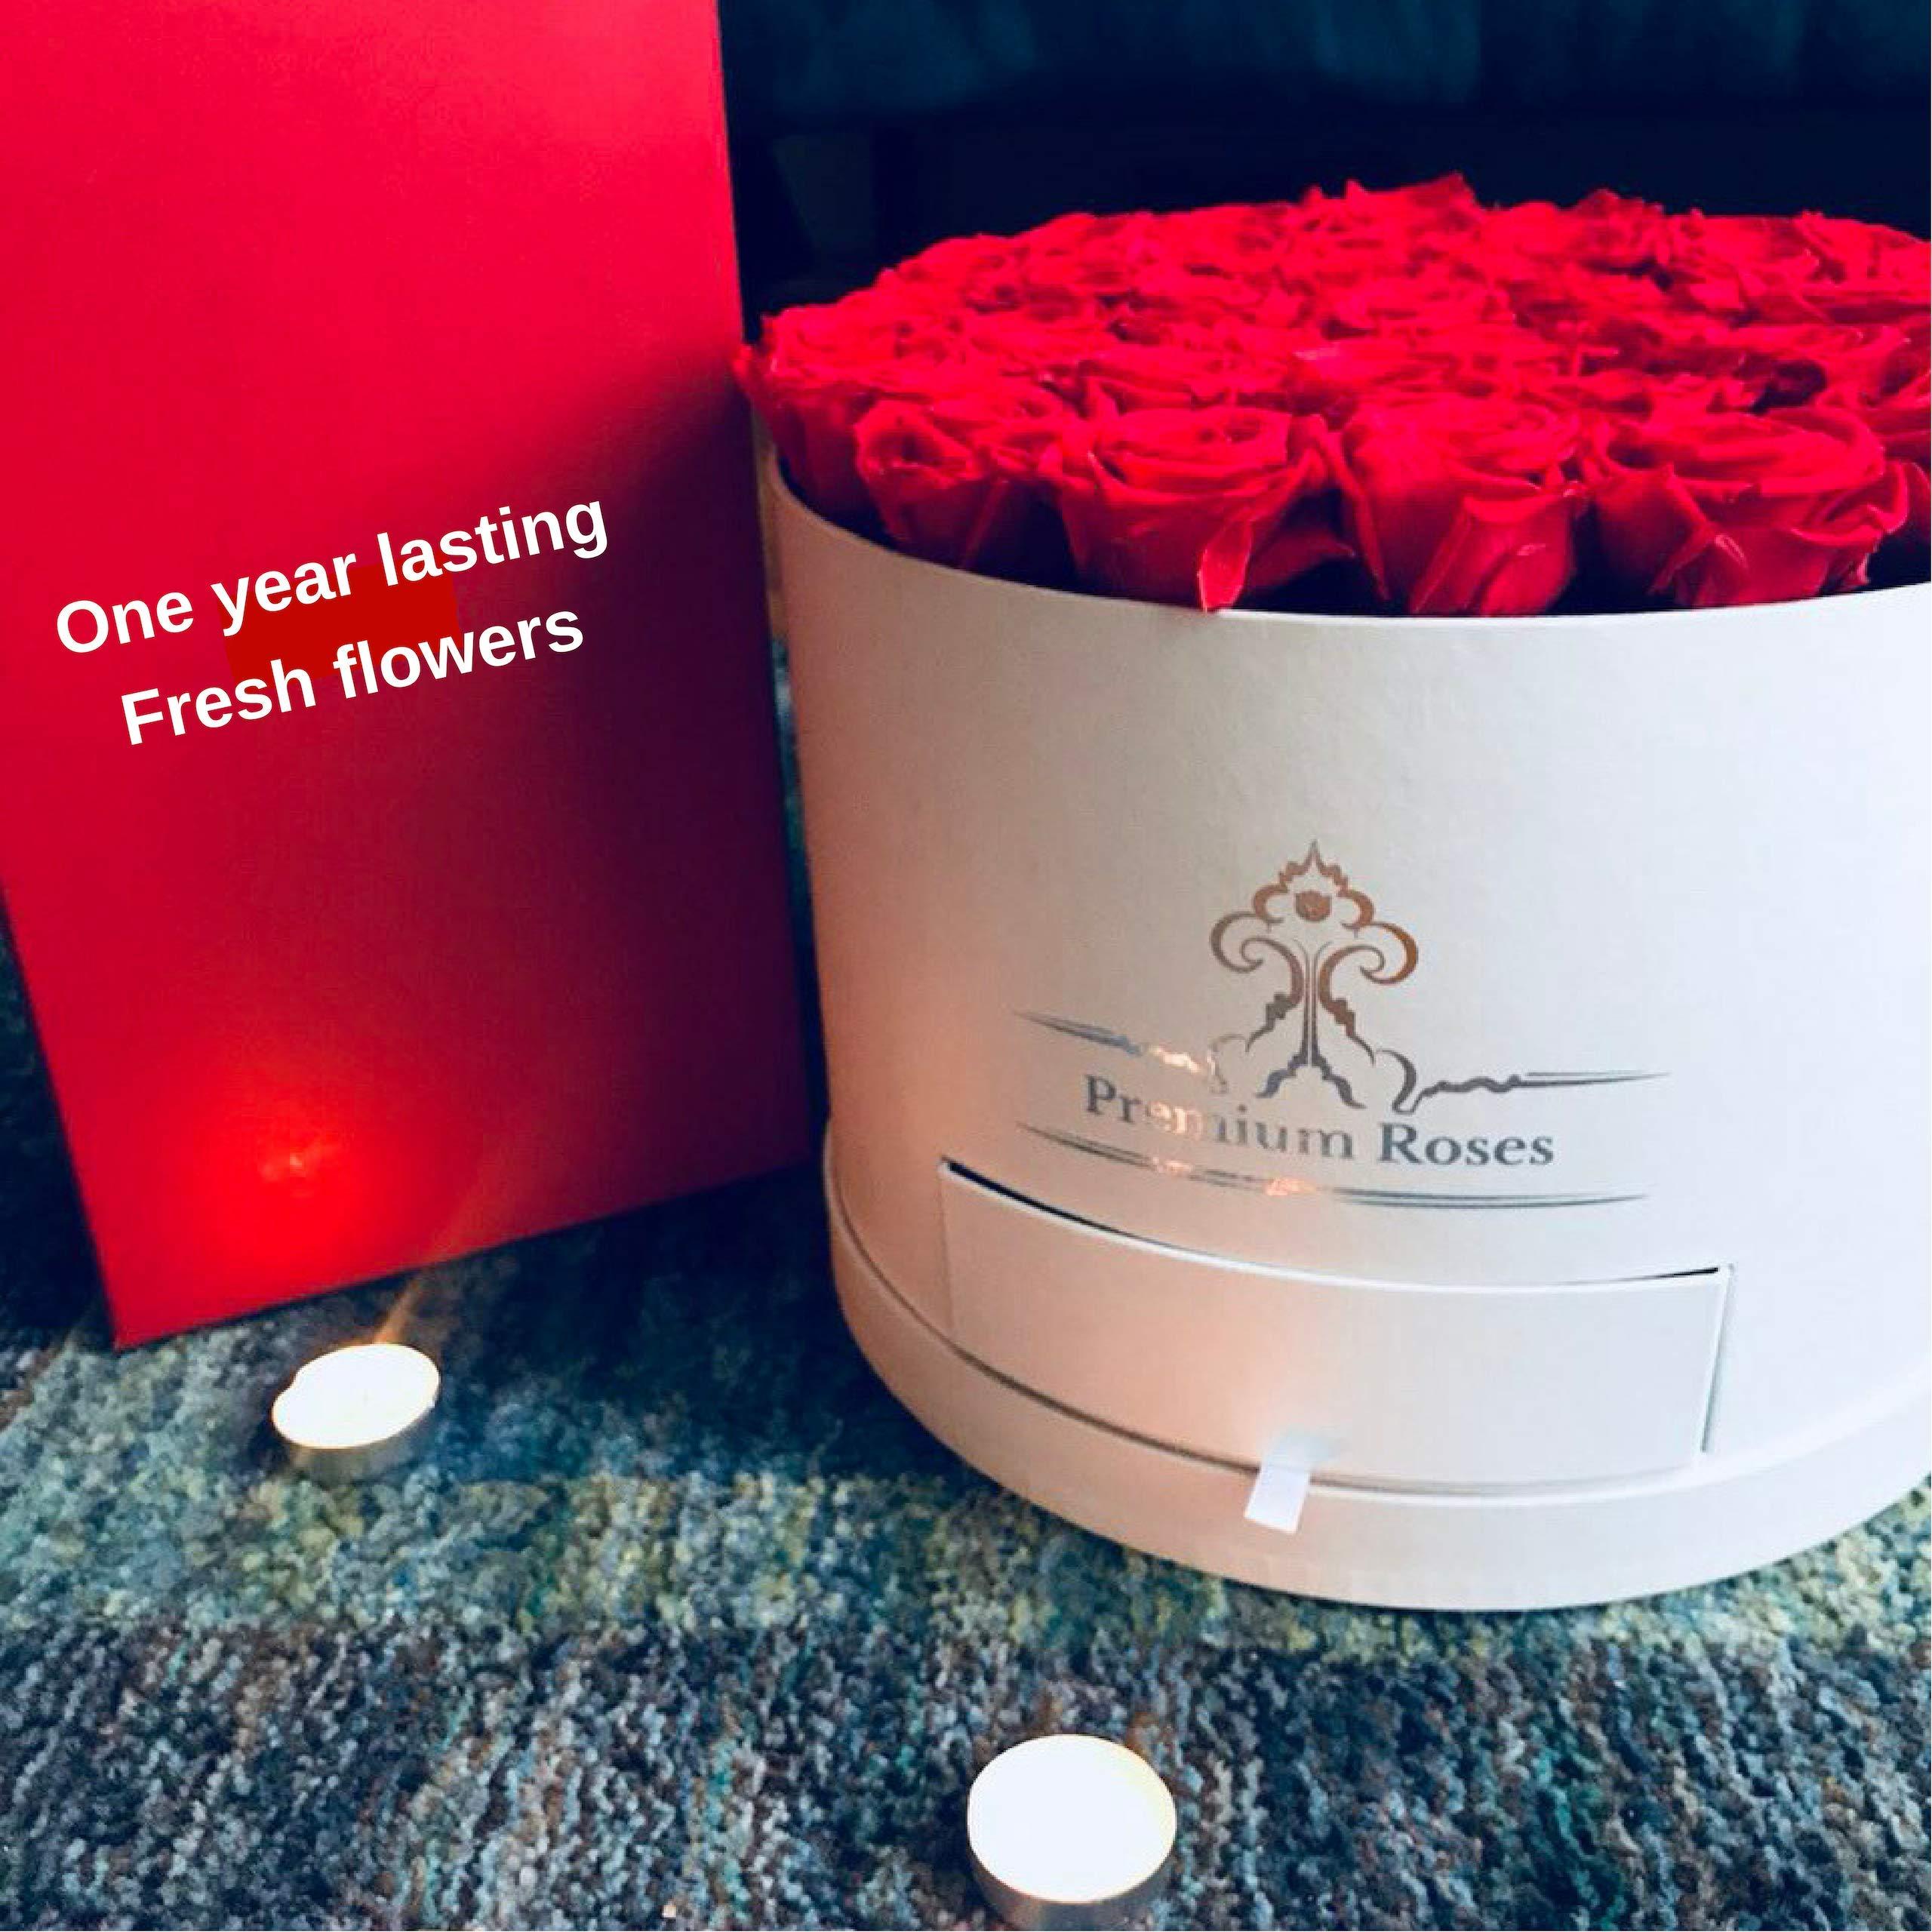 Premium Roses| Model White| Real Roses That Last 365 Days| Fresh Flowers (White Box, Large) by Premium Roses (Image #3)